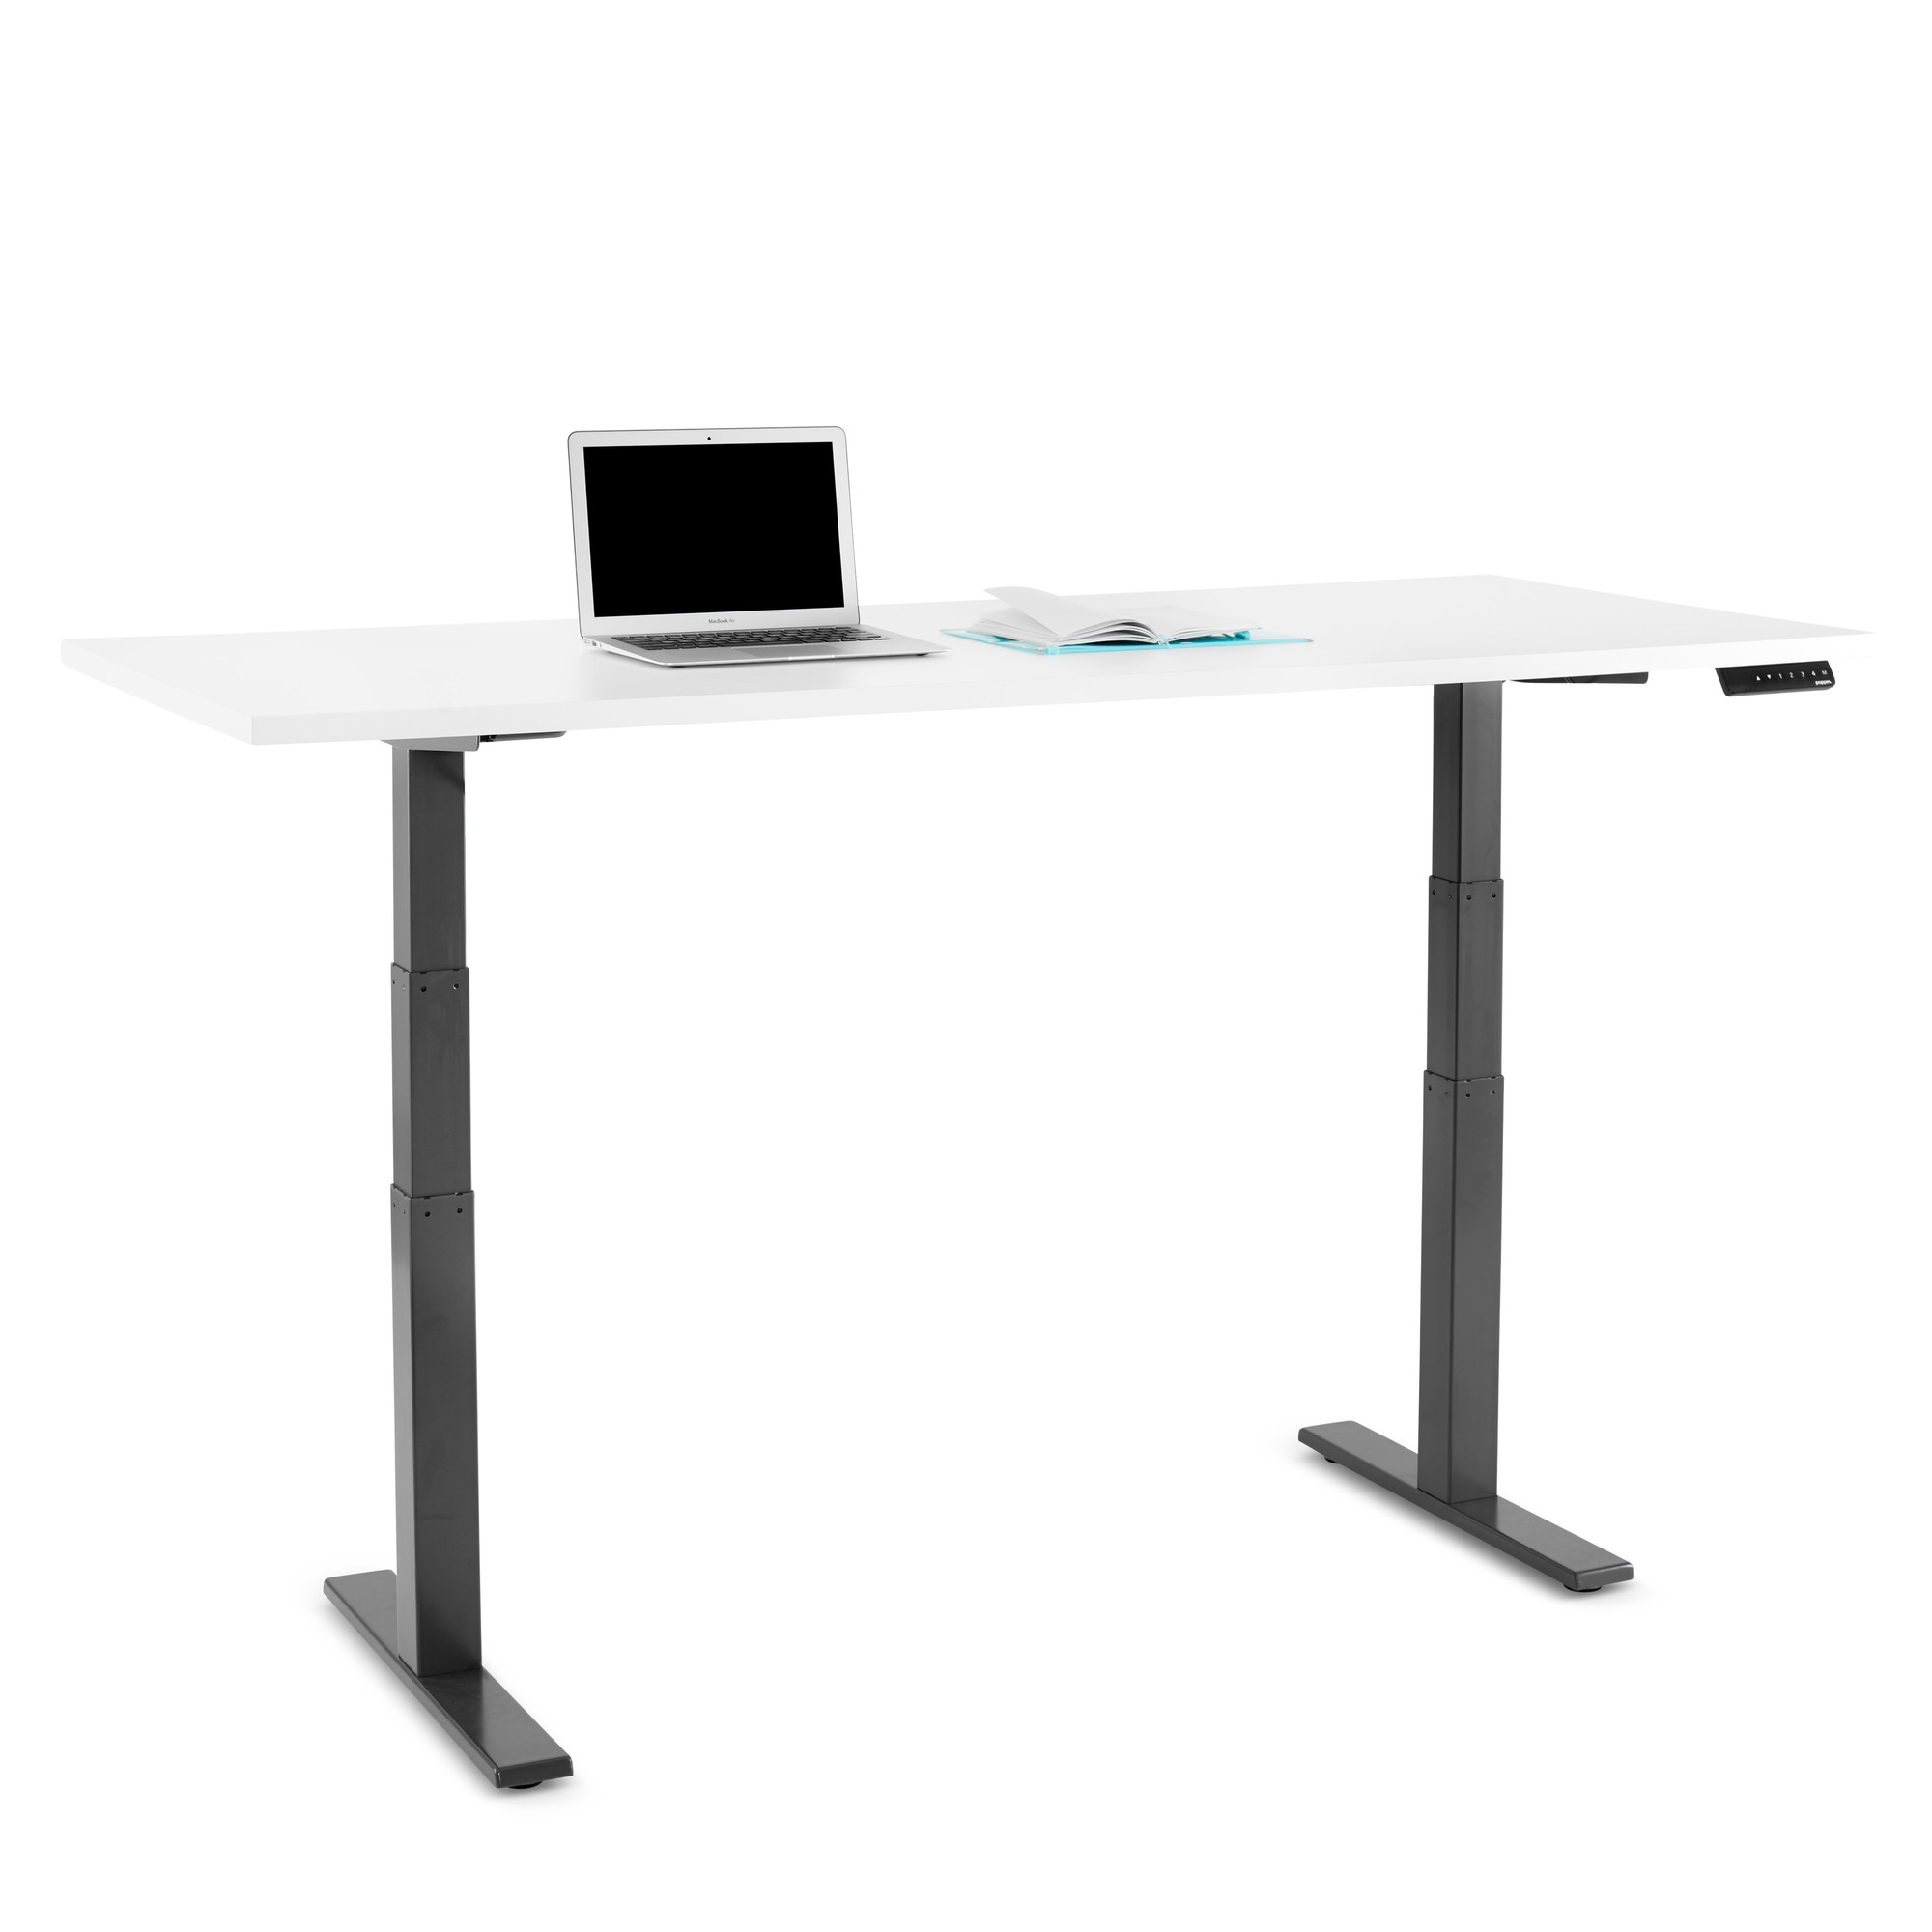 Series L Adjustable Height Table Charcoal Legs Adjustable Height